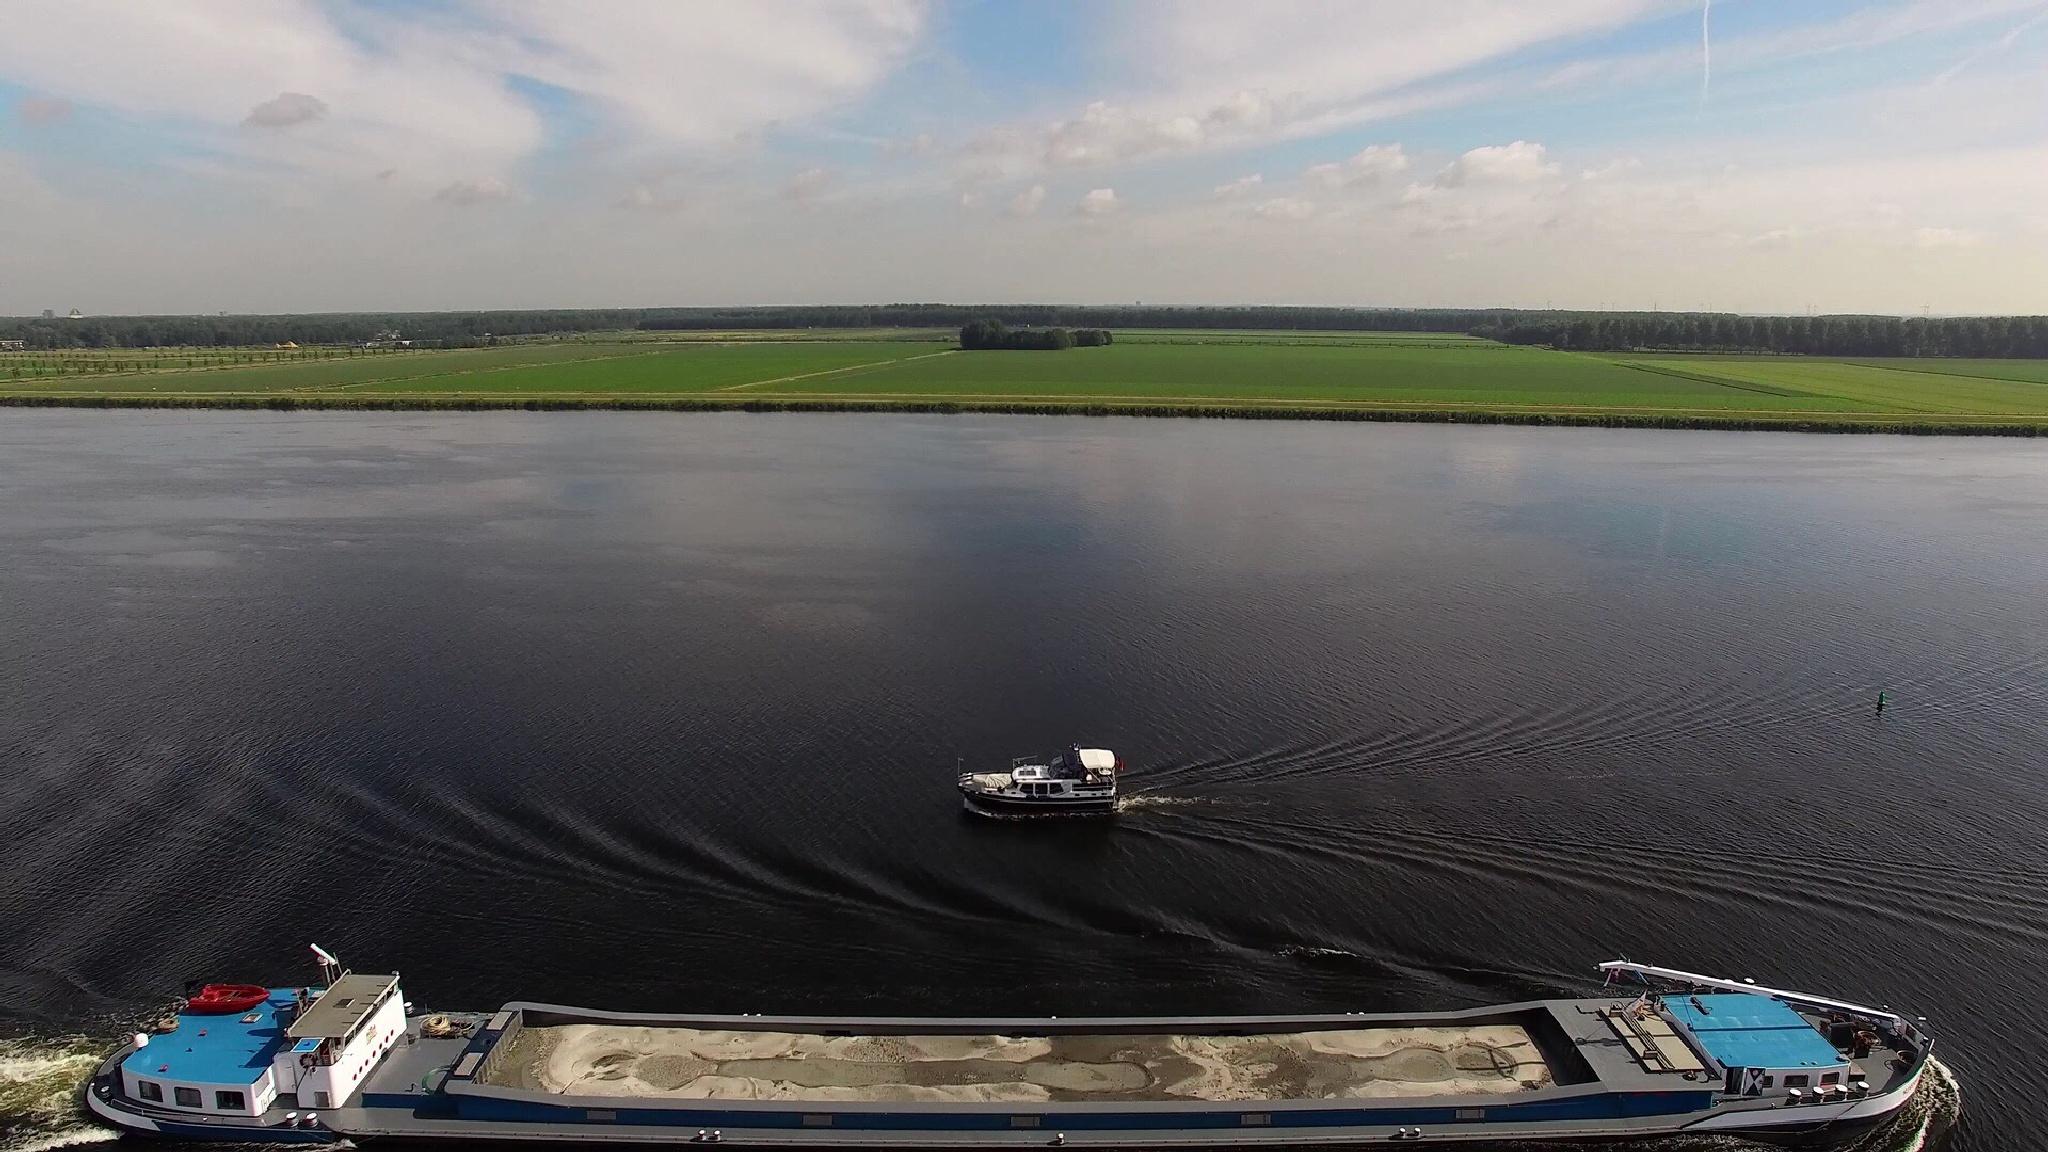 Little Boat, Big Boat by Aerial Bonanza